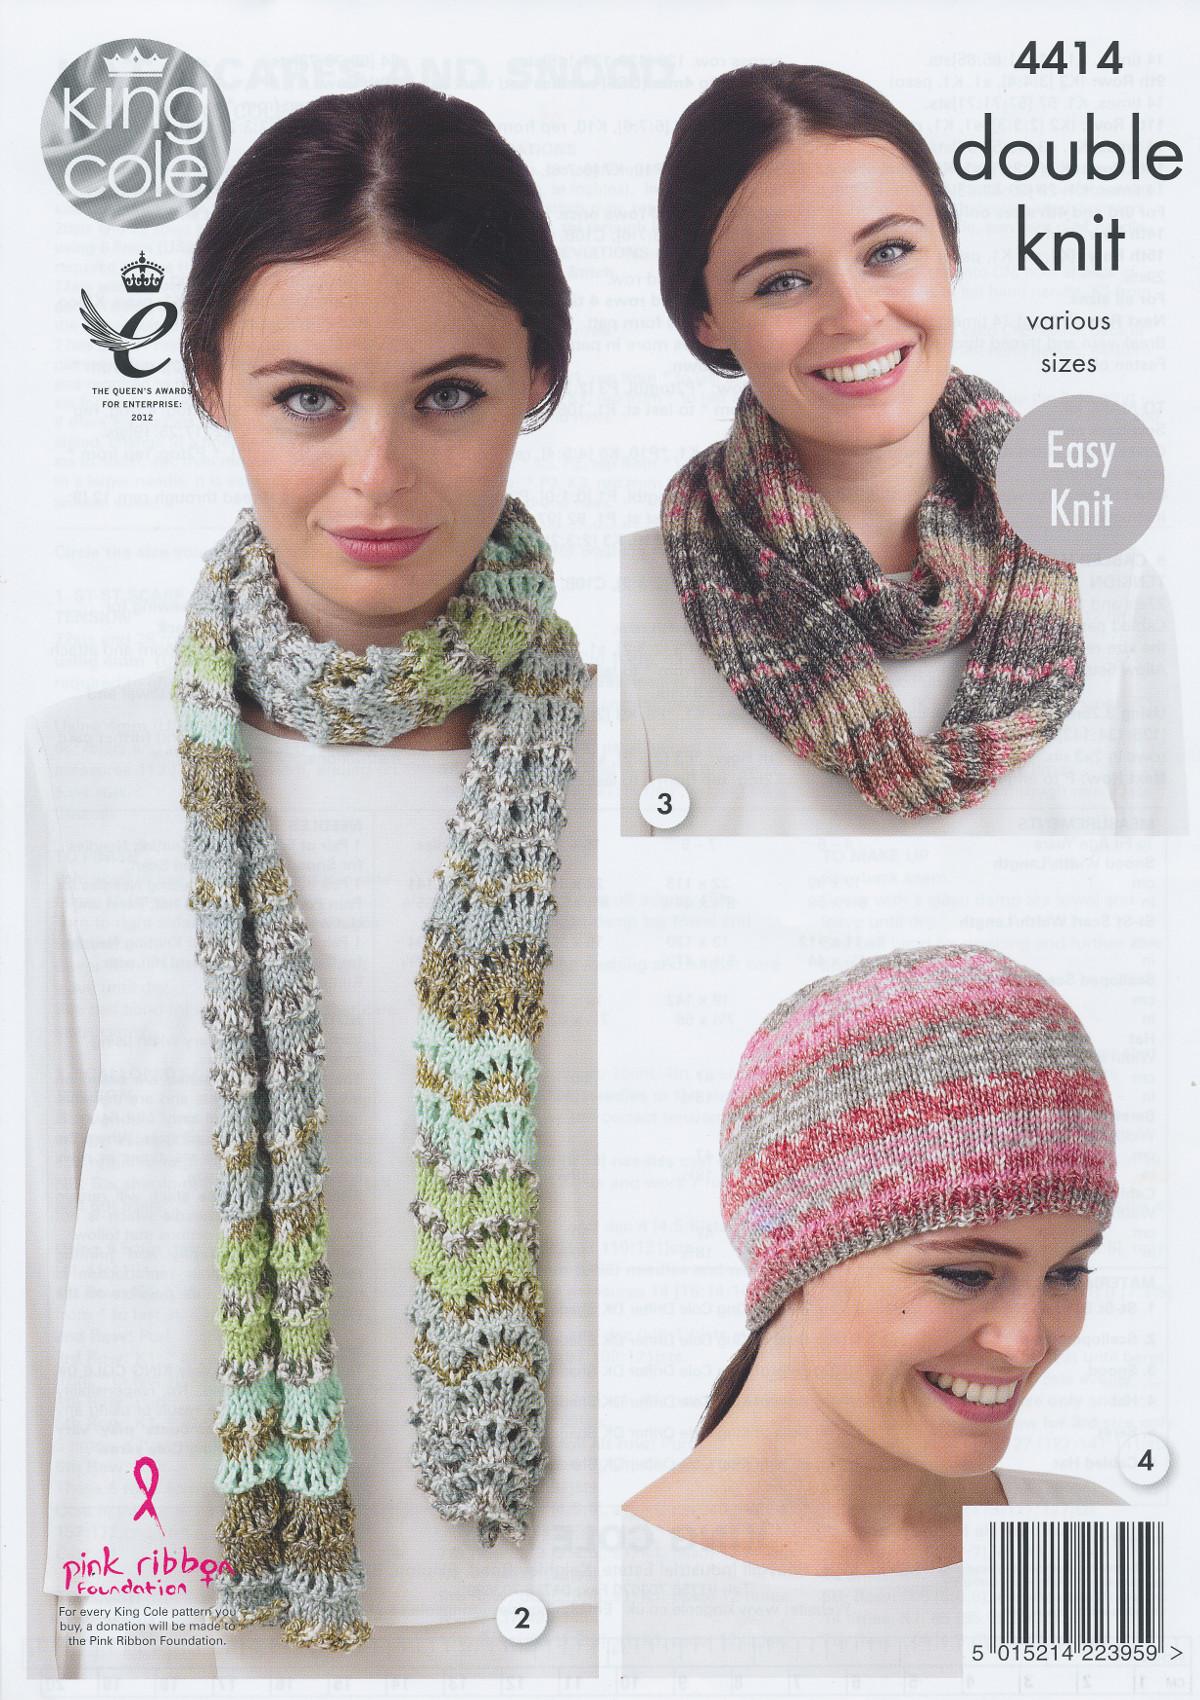 Snood Knitting Pattern Double Knit : King Cole Ladies Double Knit Pattern Womens Hat Scarves Snood Drifter DK 4414...